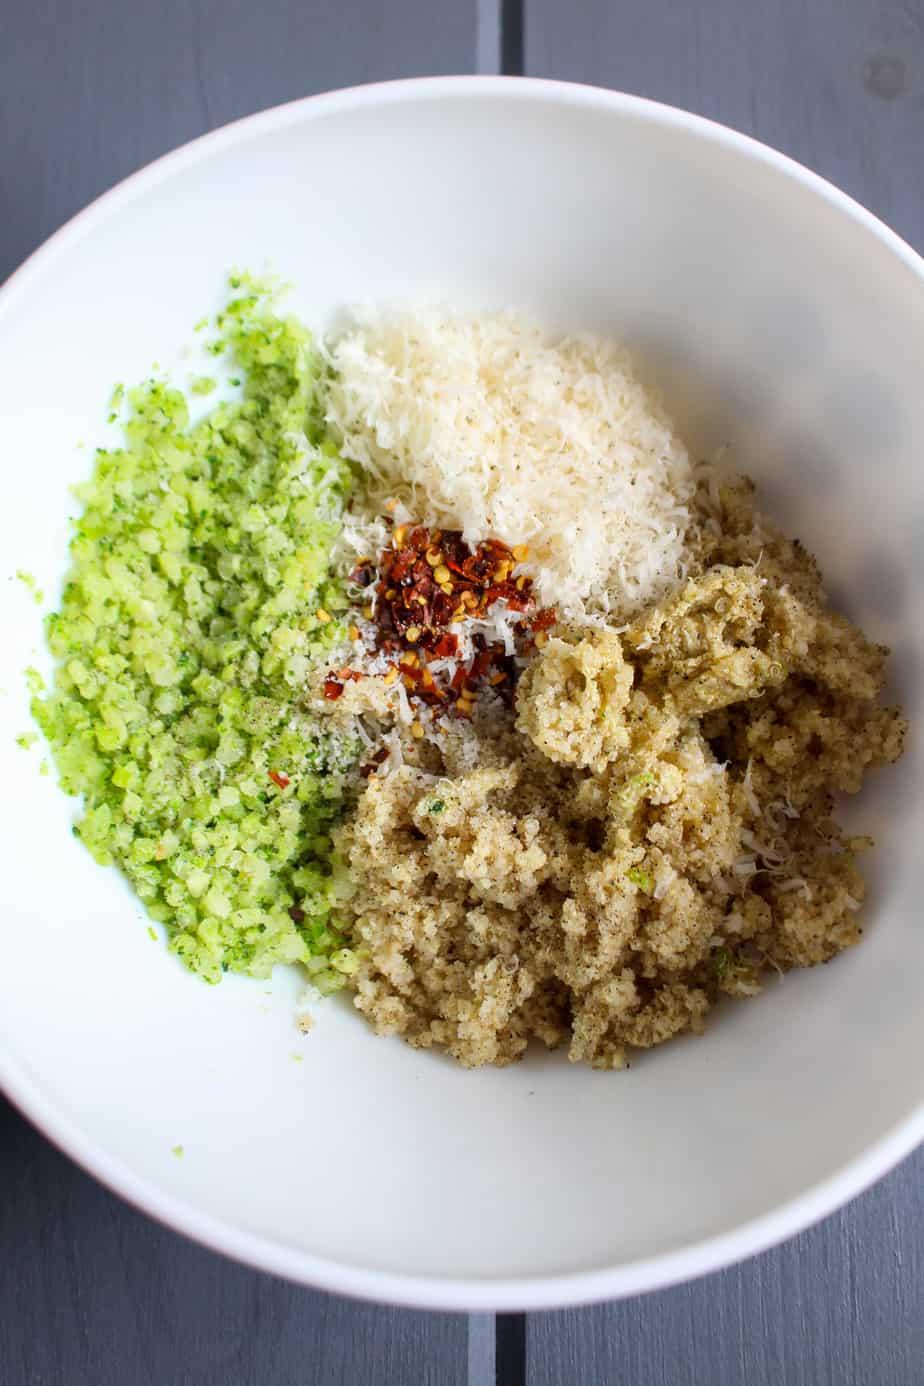 How to make cheesy broccoli quinoa bites | www.frugalnutrition.com